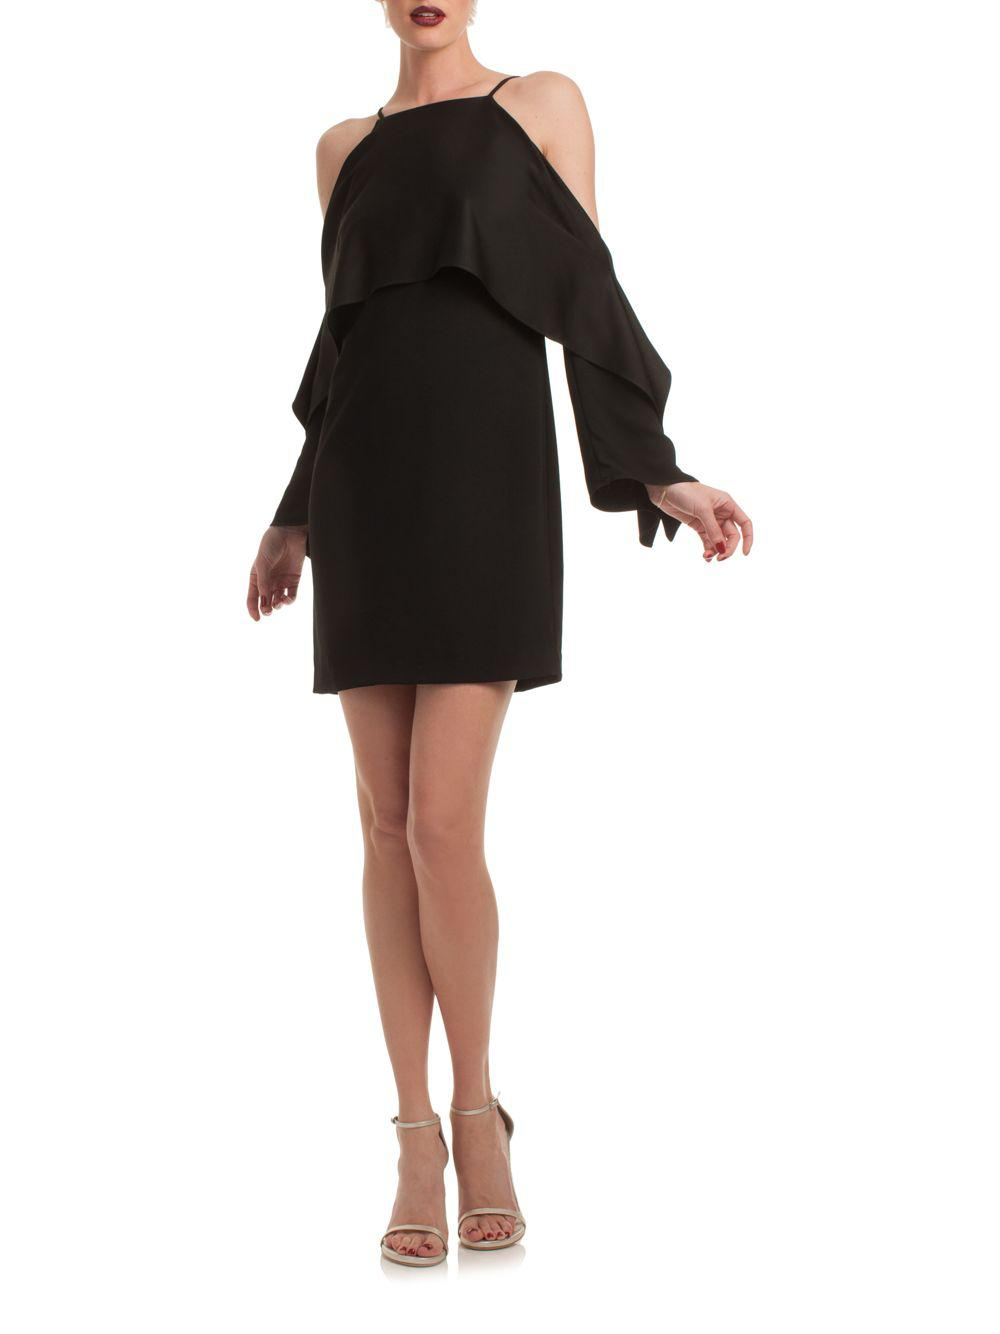 Trina Turk Women S Black Cold Shoulder Cape Dress